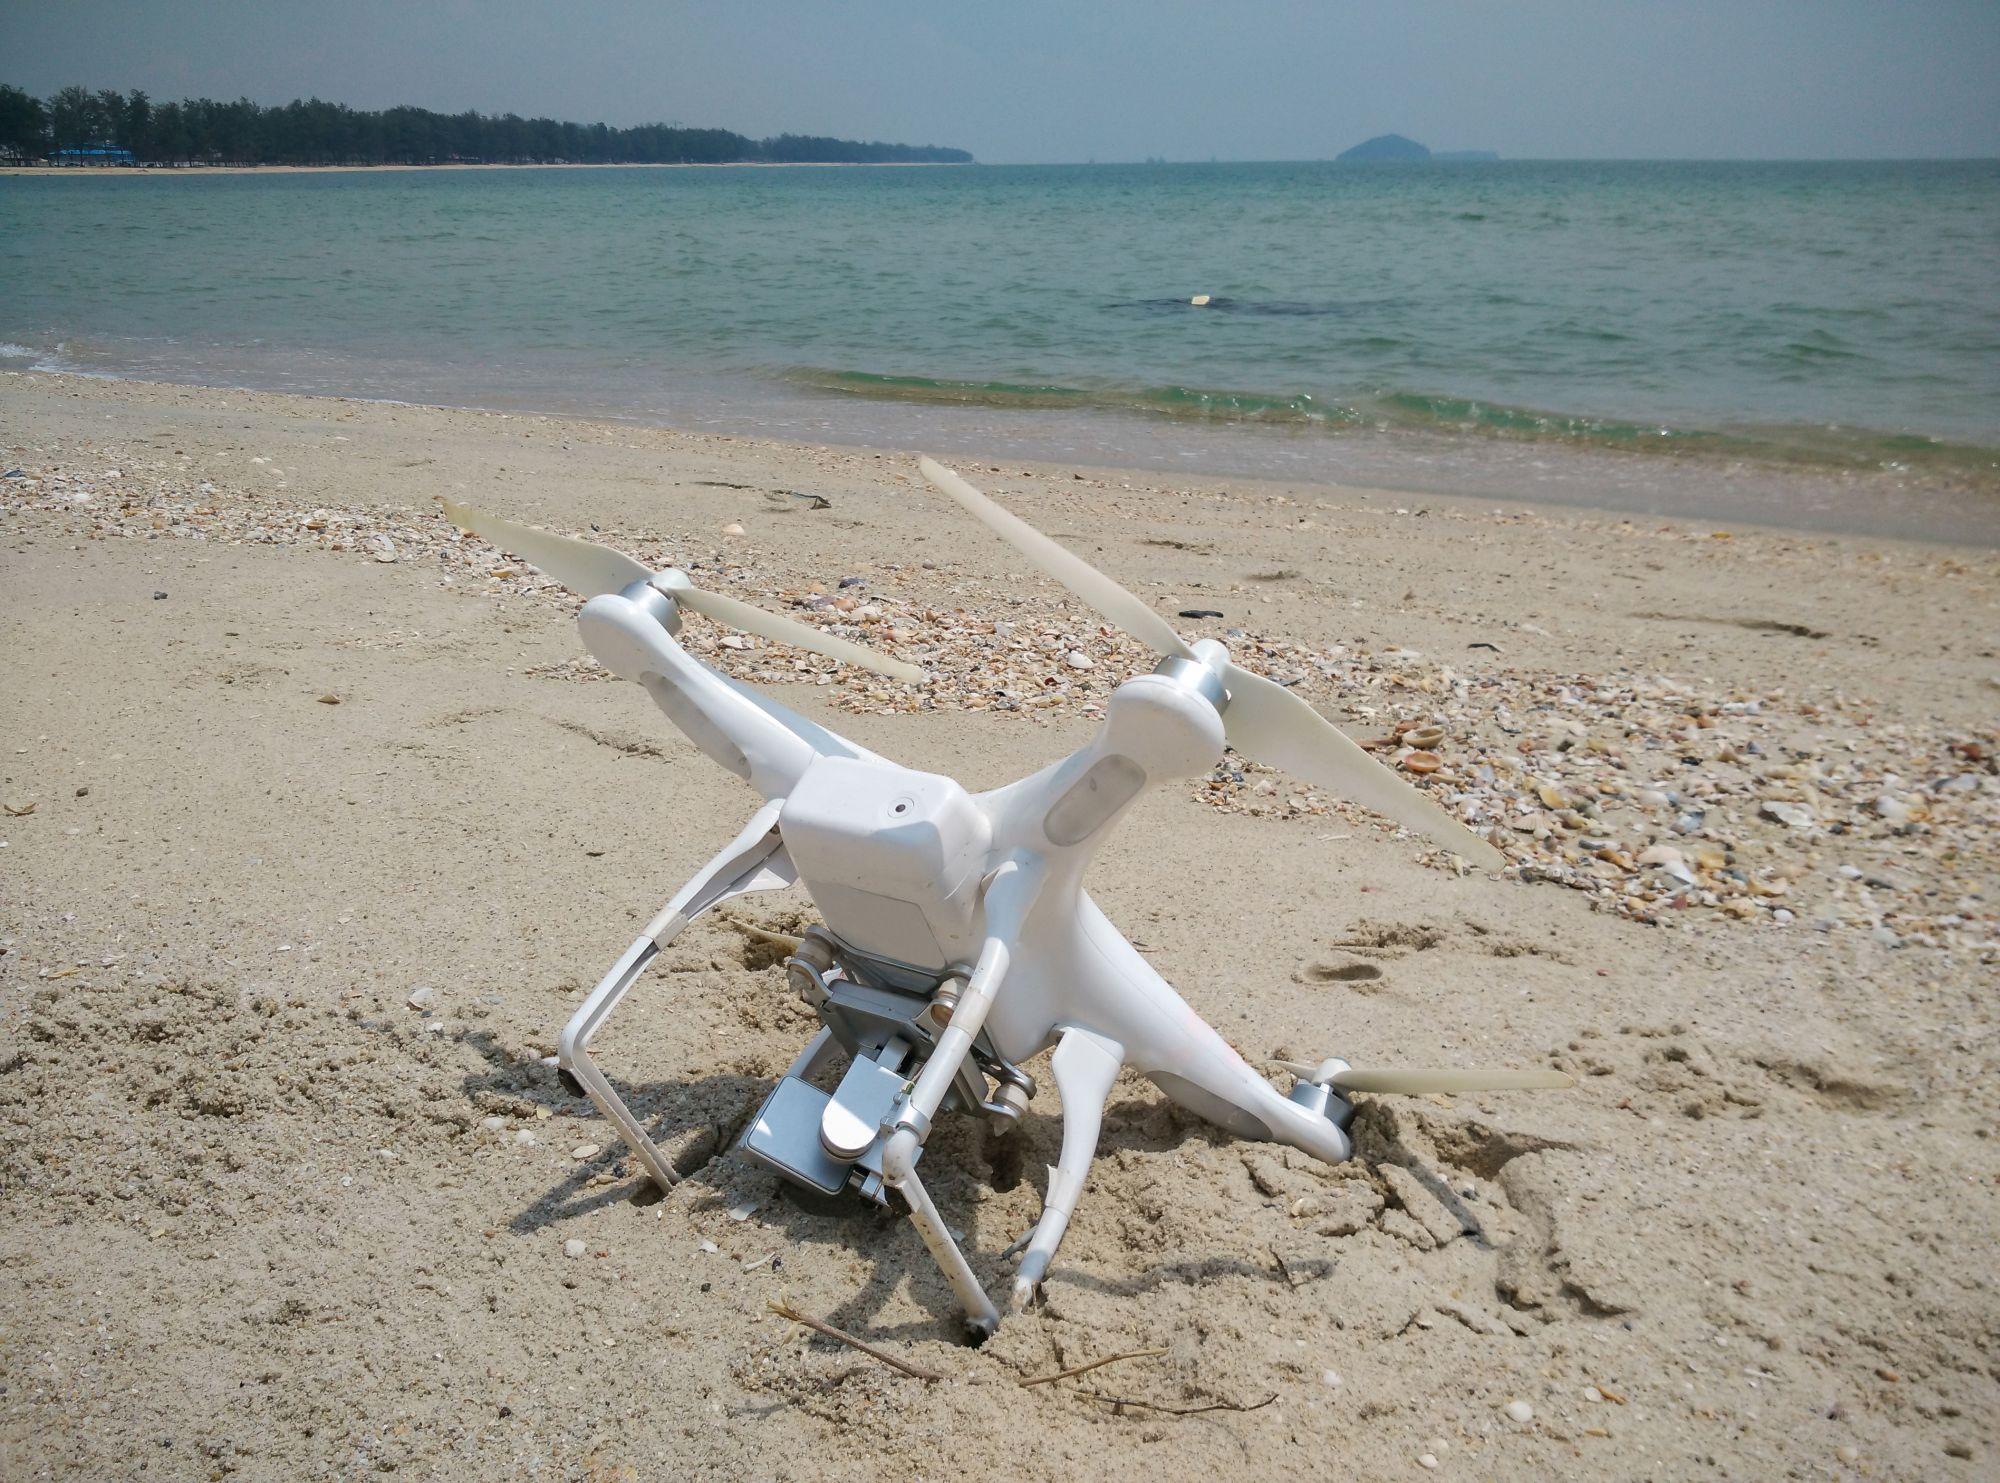 Homokba esett drón